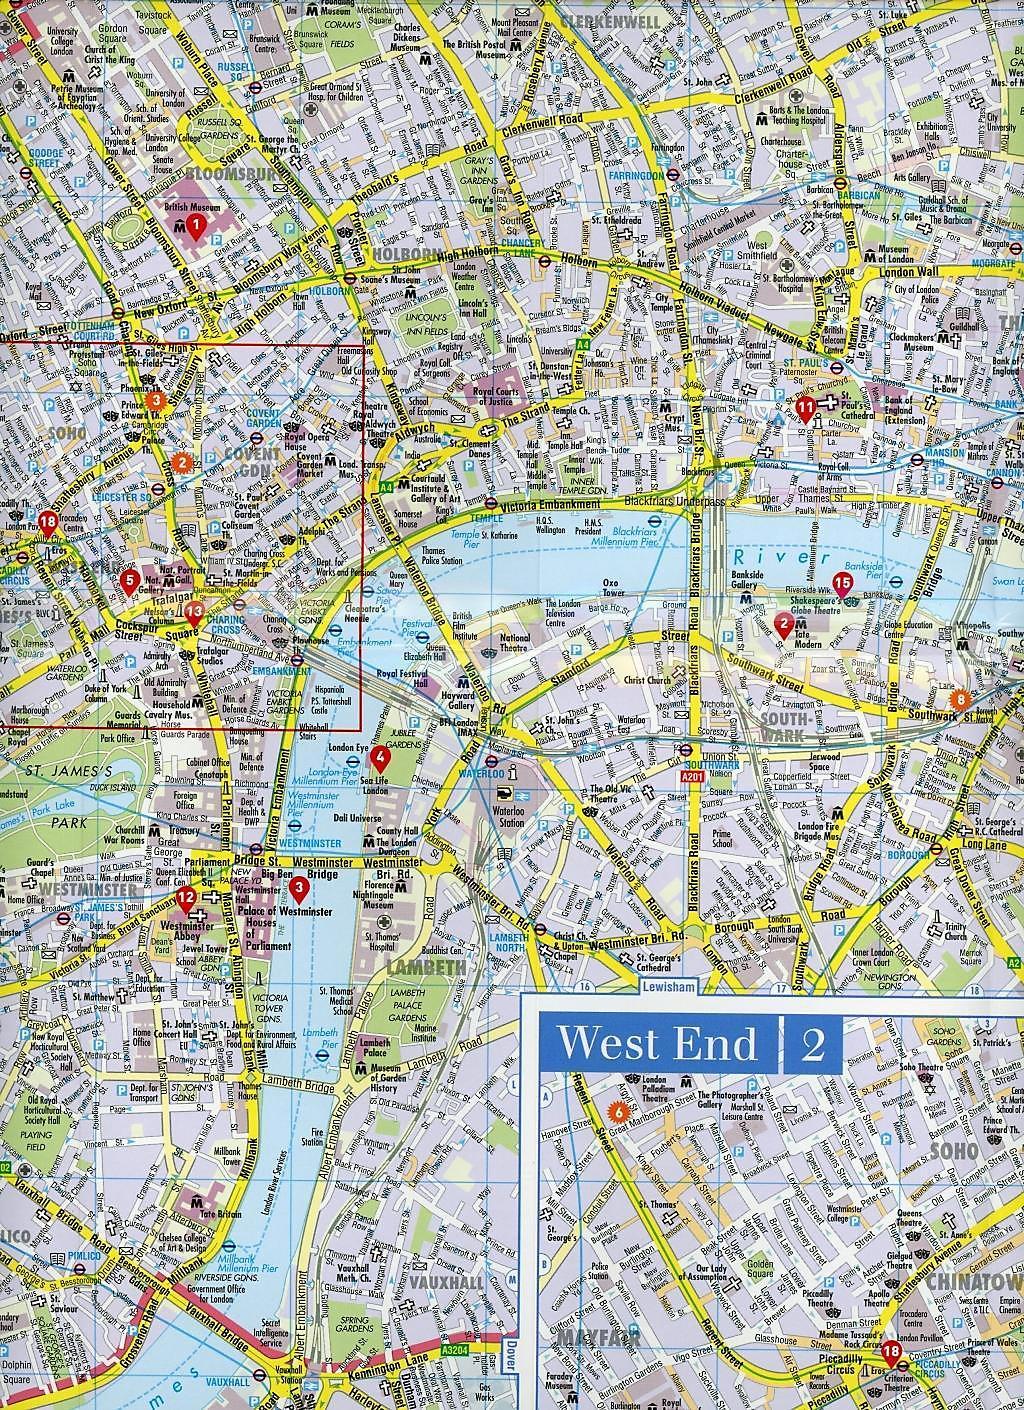 EASY MAP LONDON Buch jetzt bei Weltbild.de online bestellen